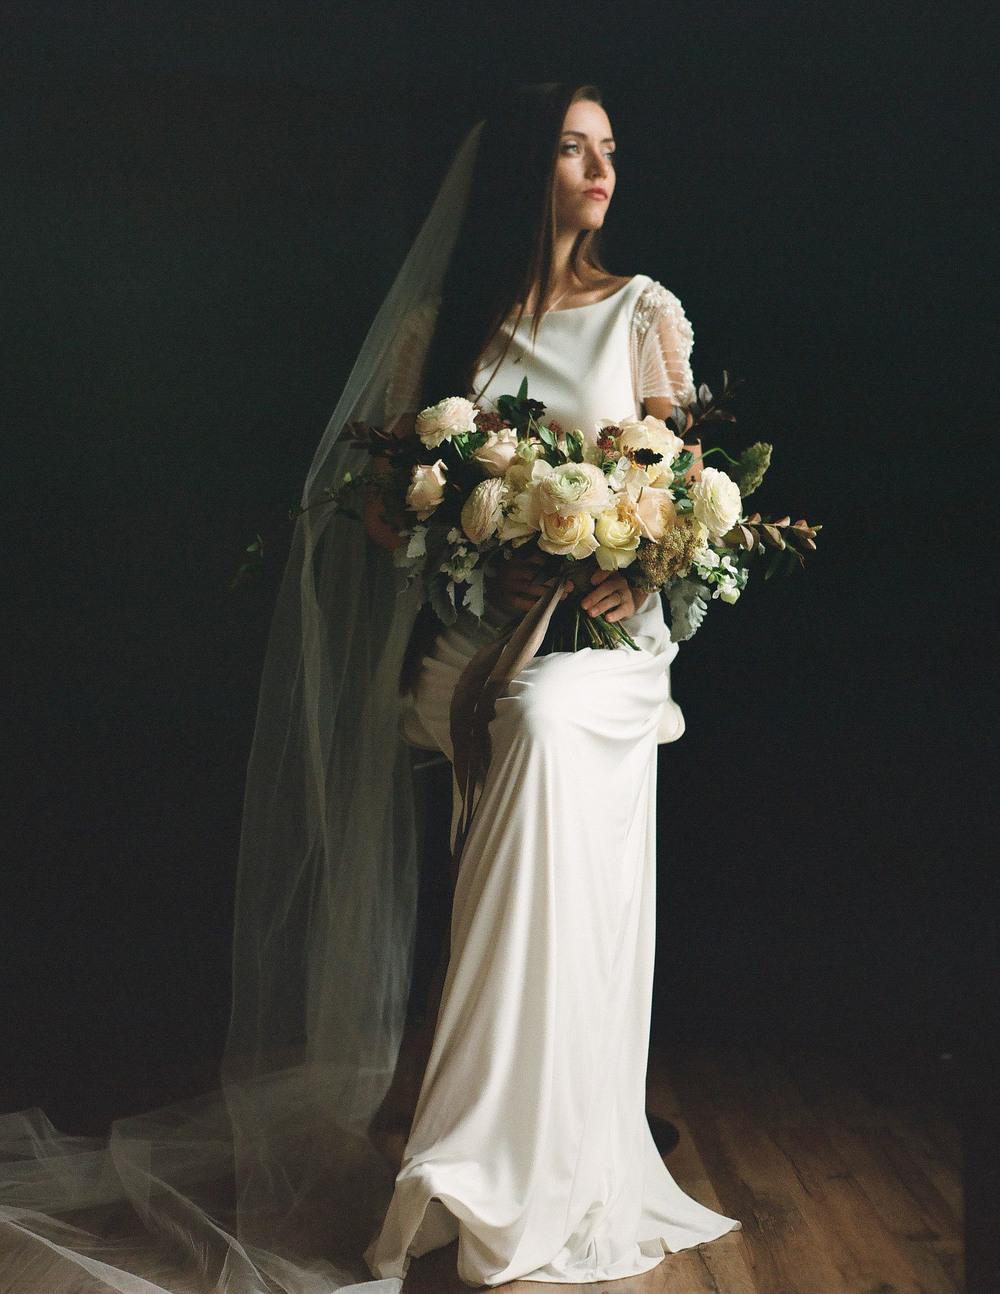 salt-lake-city-wedding-photographer-15.jpg